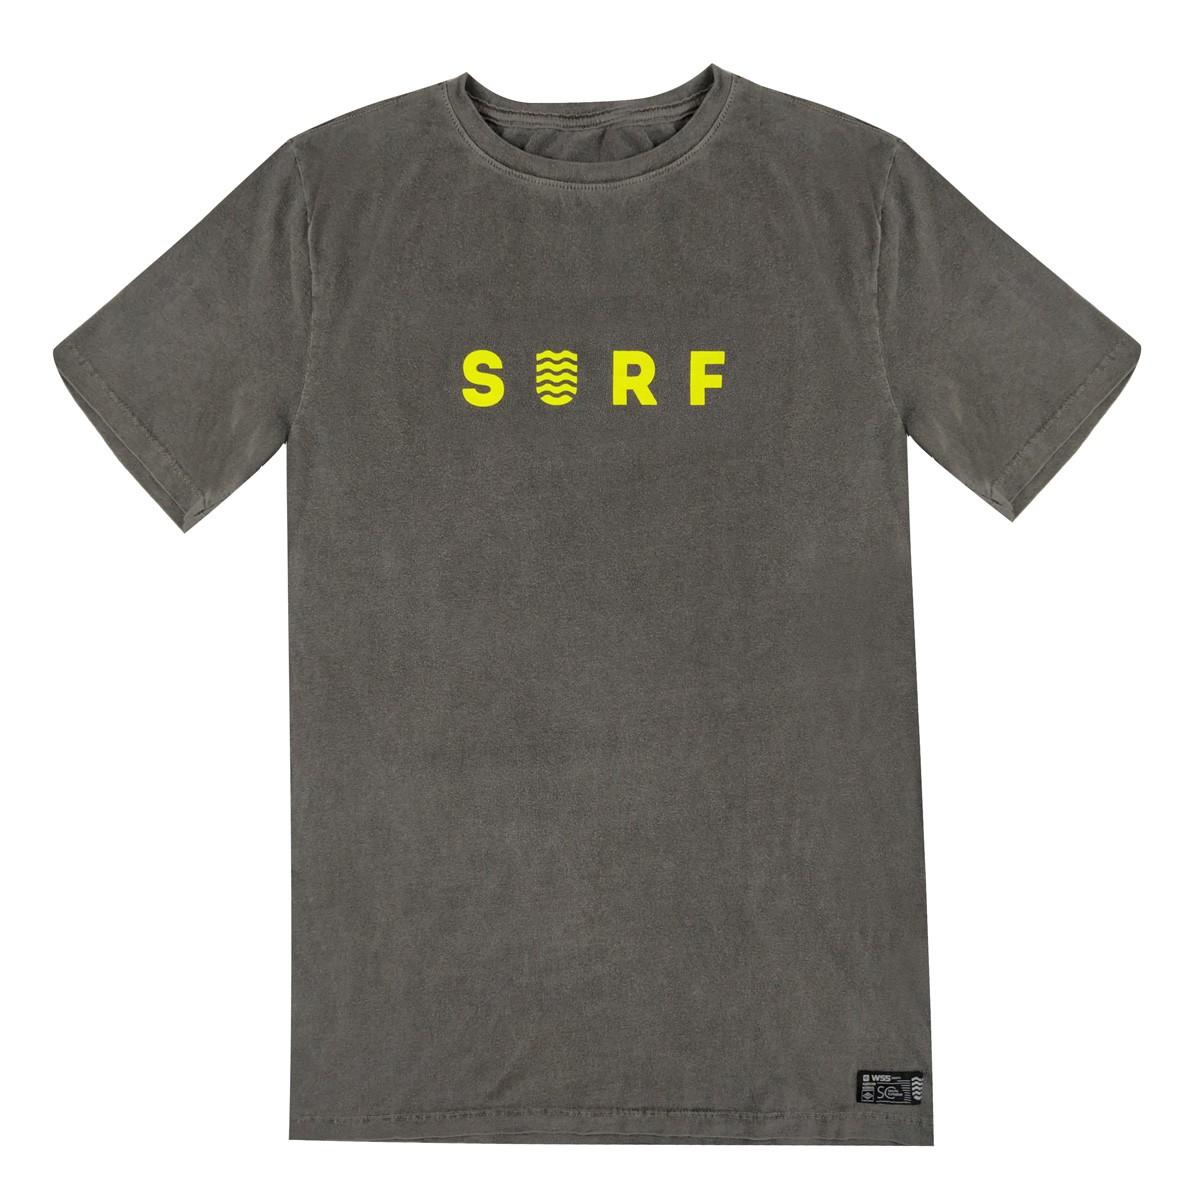 Camiseta WSS Estonada Cinza Surf Neon Yellow Masculino